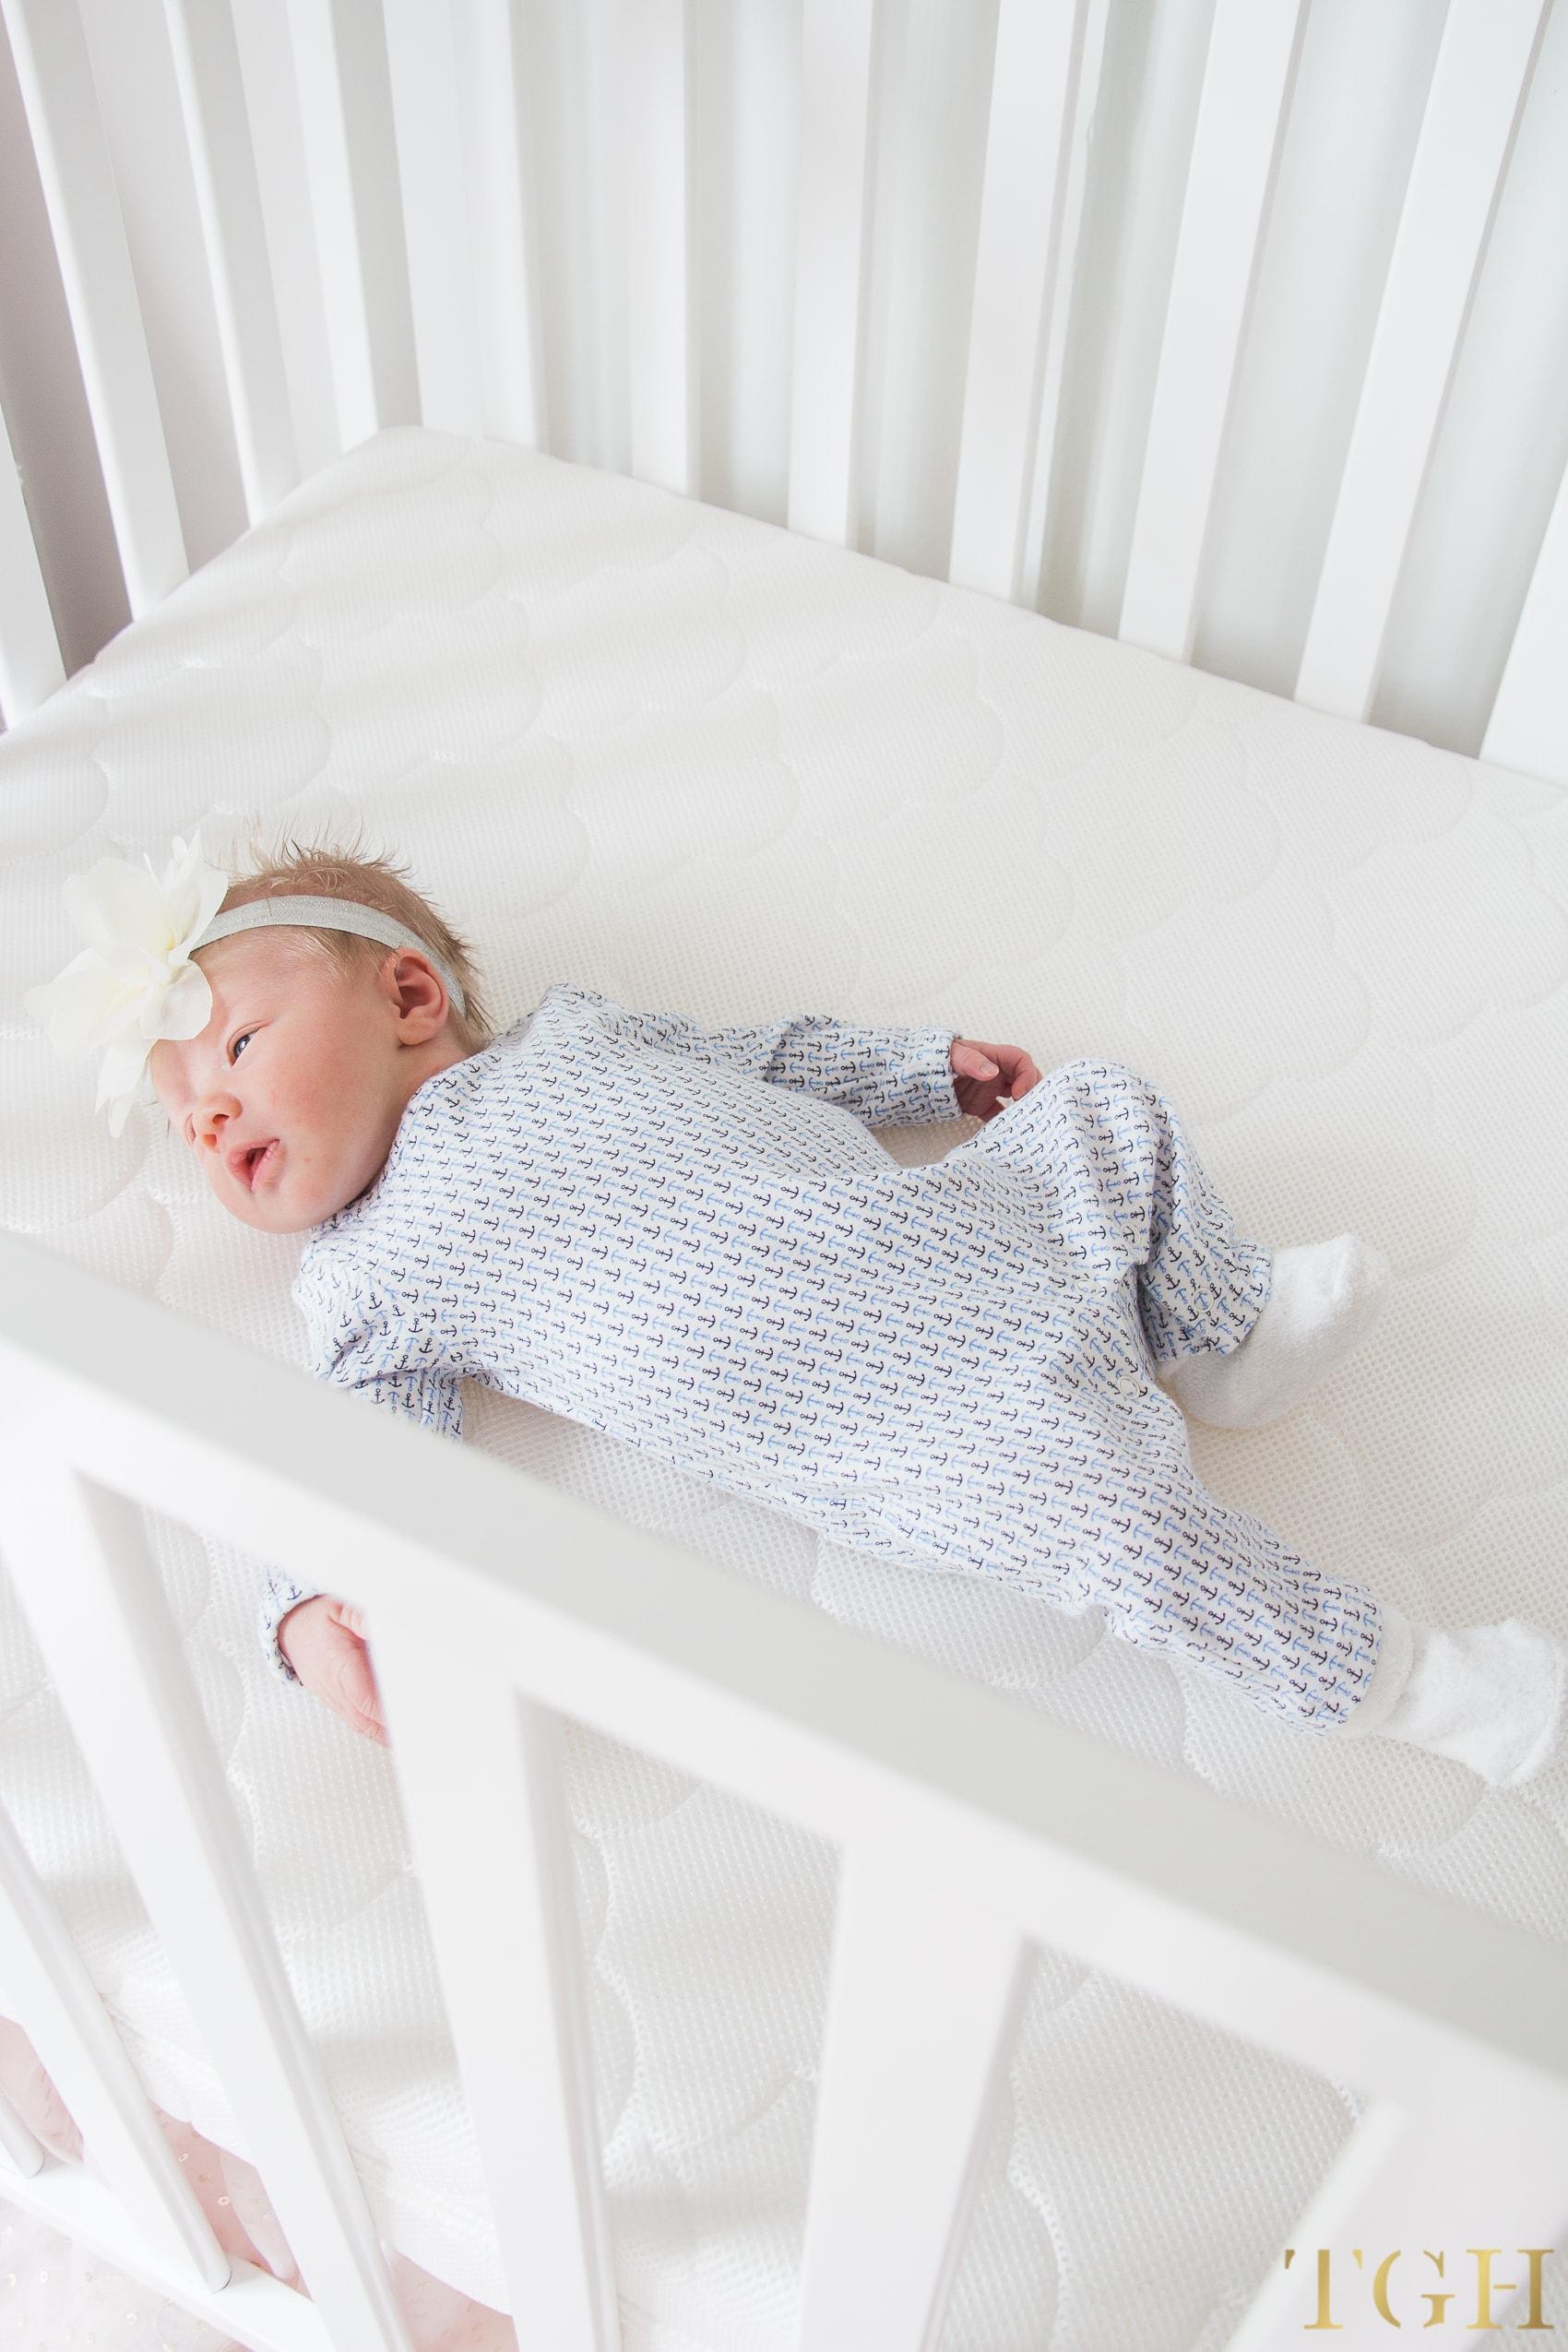 Newton Crib Mattress Sheets Cheap Online